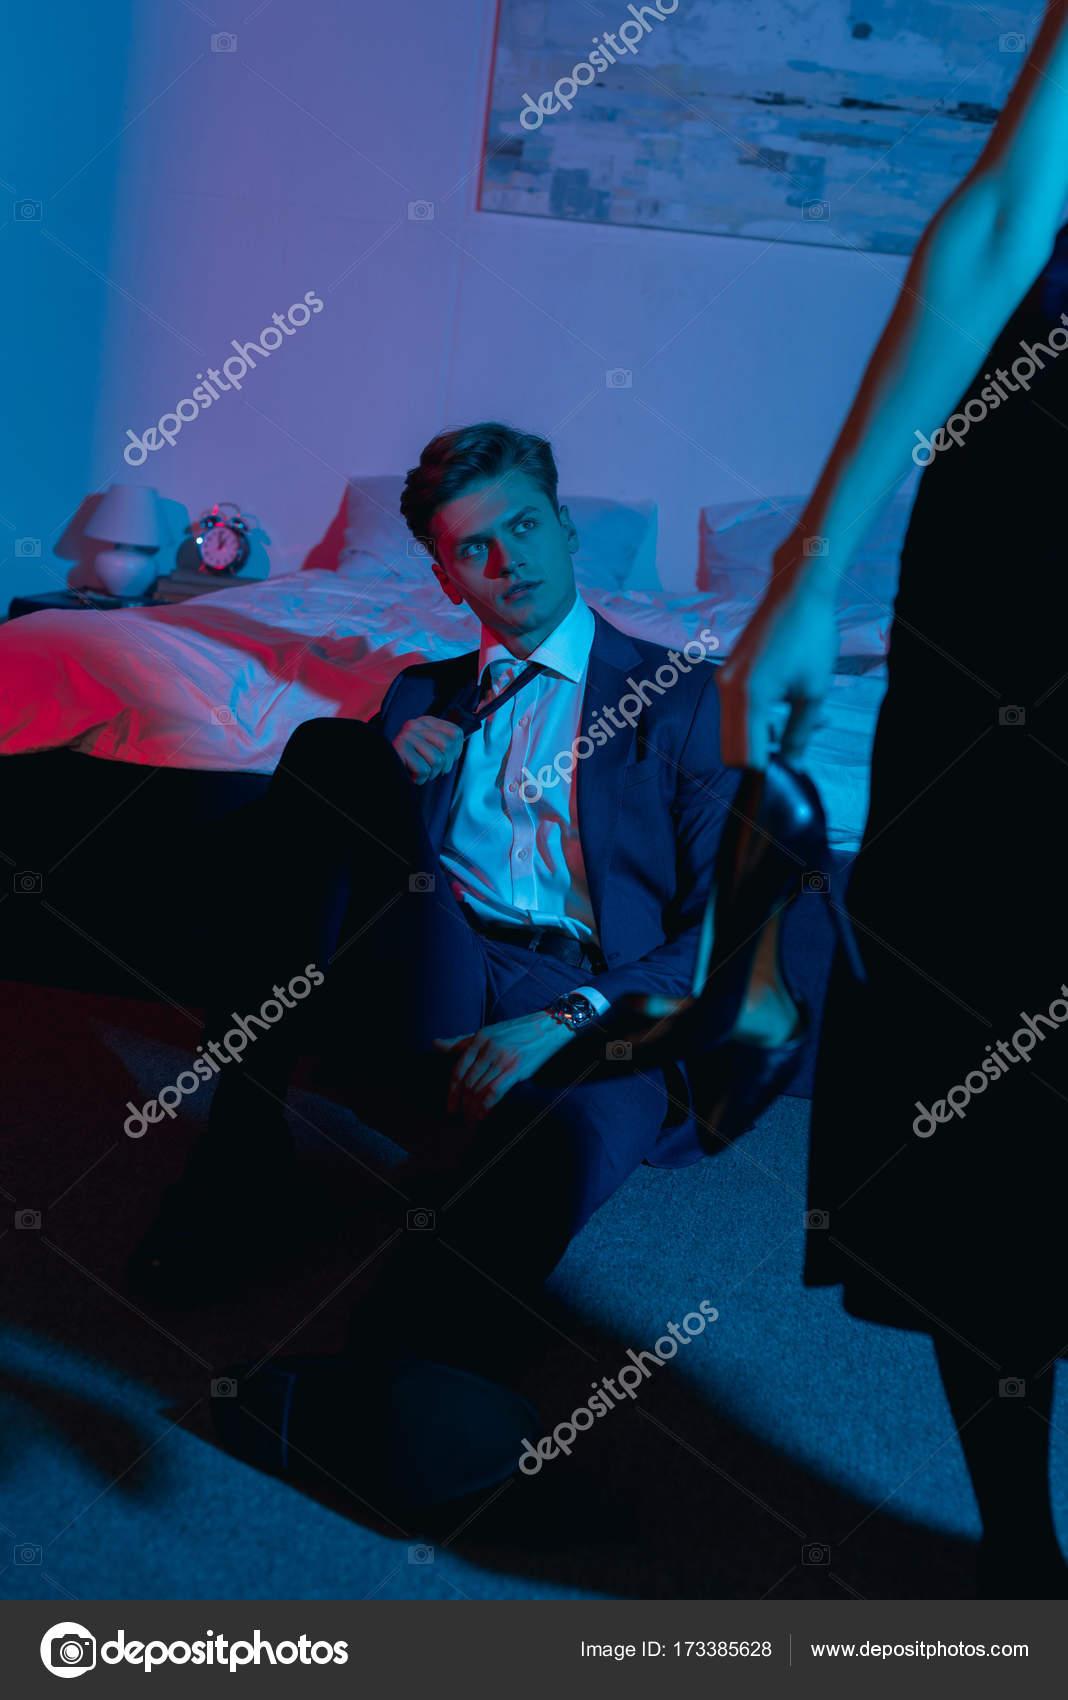 Homme cherche femme dans la chambre photographie igorvetushko 173385628 - Cherche femme de chambre ...